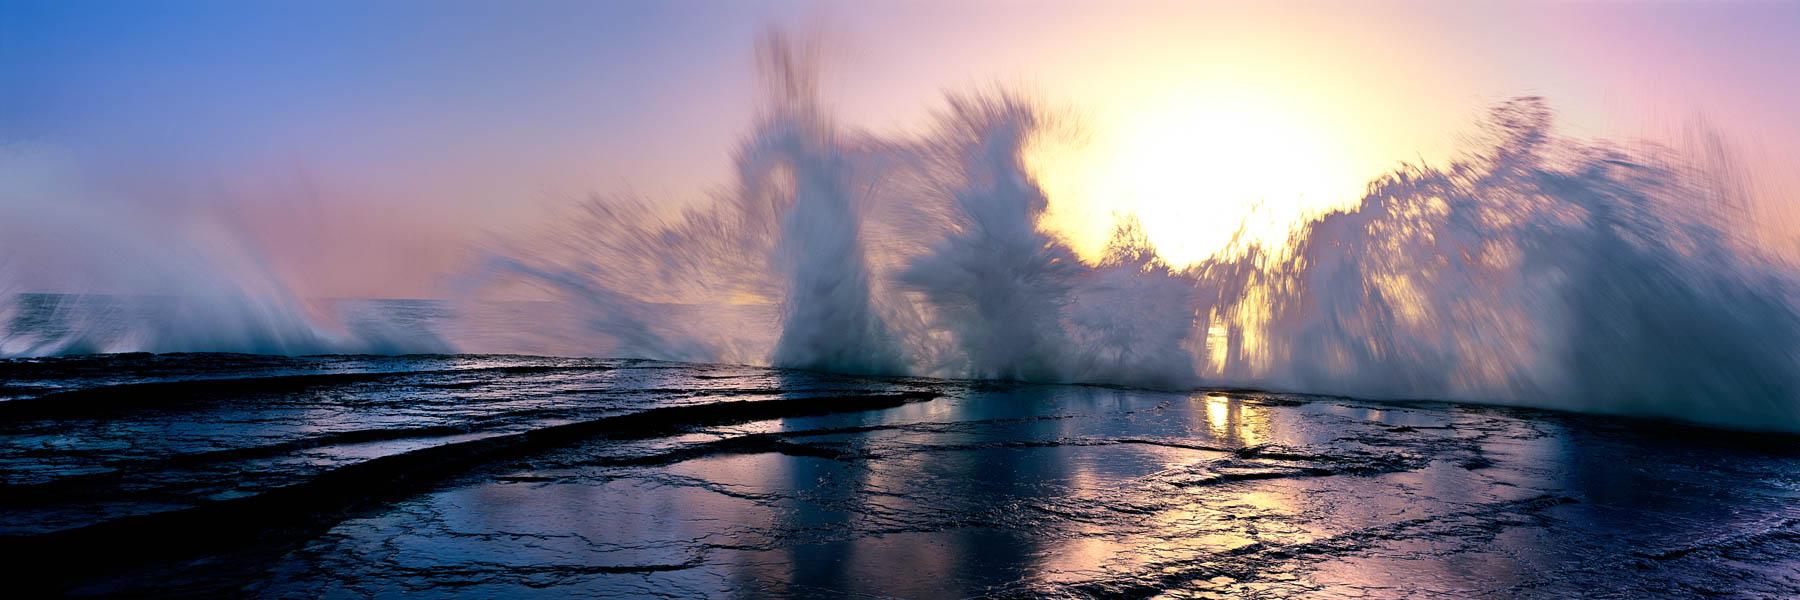 A wave smashing against the rock ledge at sunrise, Terrigal, Central Coast, Australia.